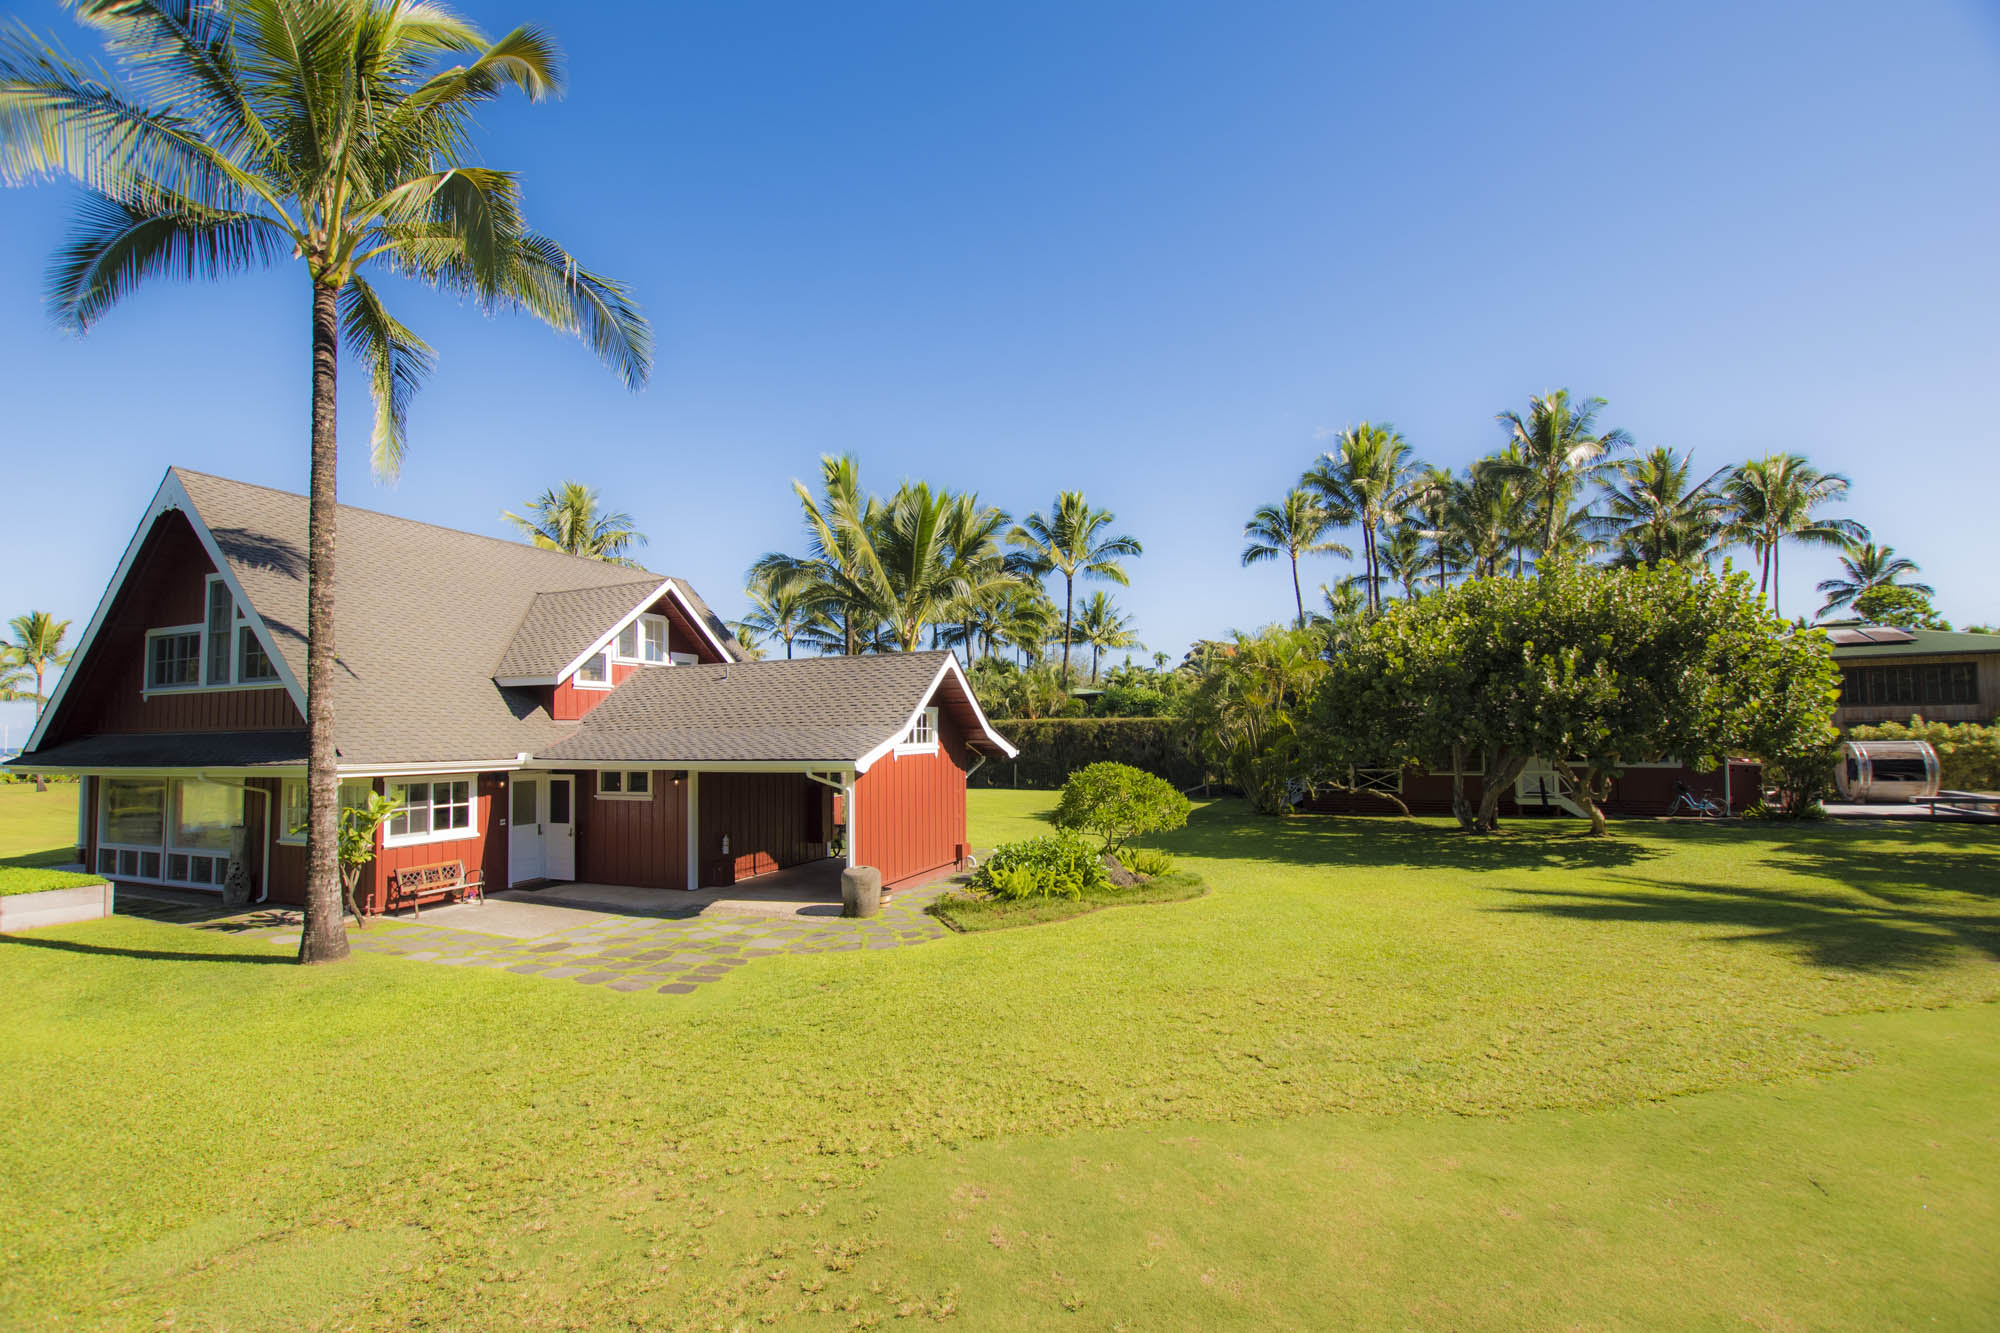 Kauai-217-Hanalei Bay30